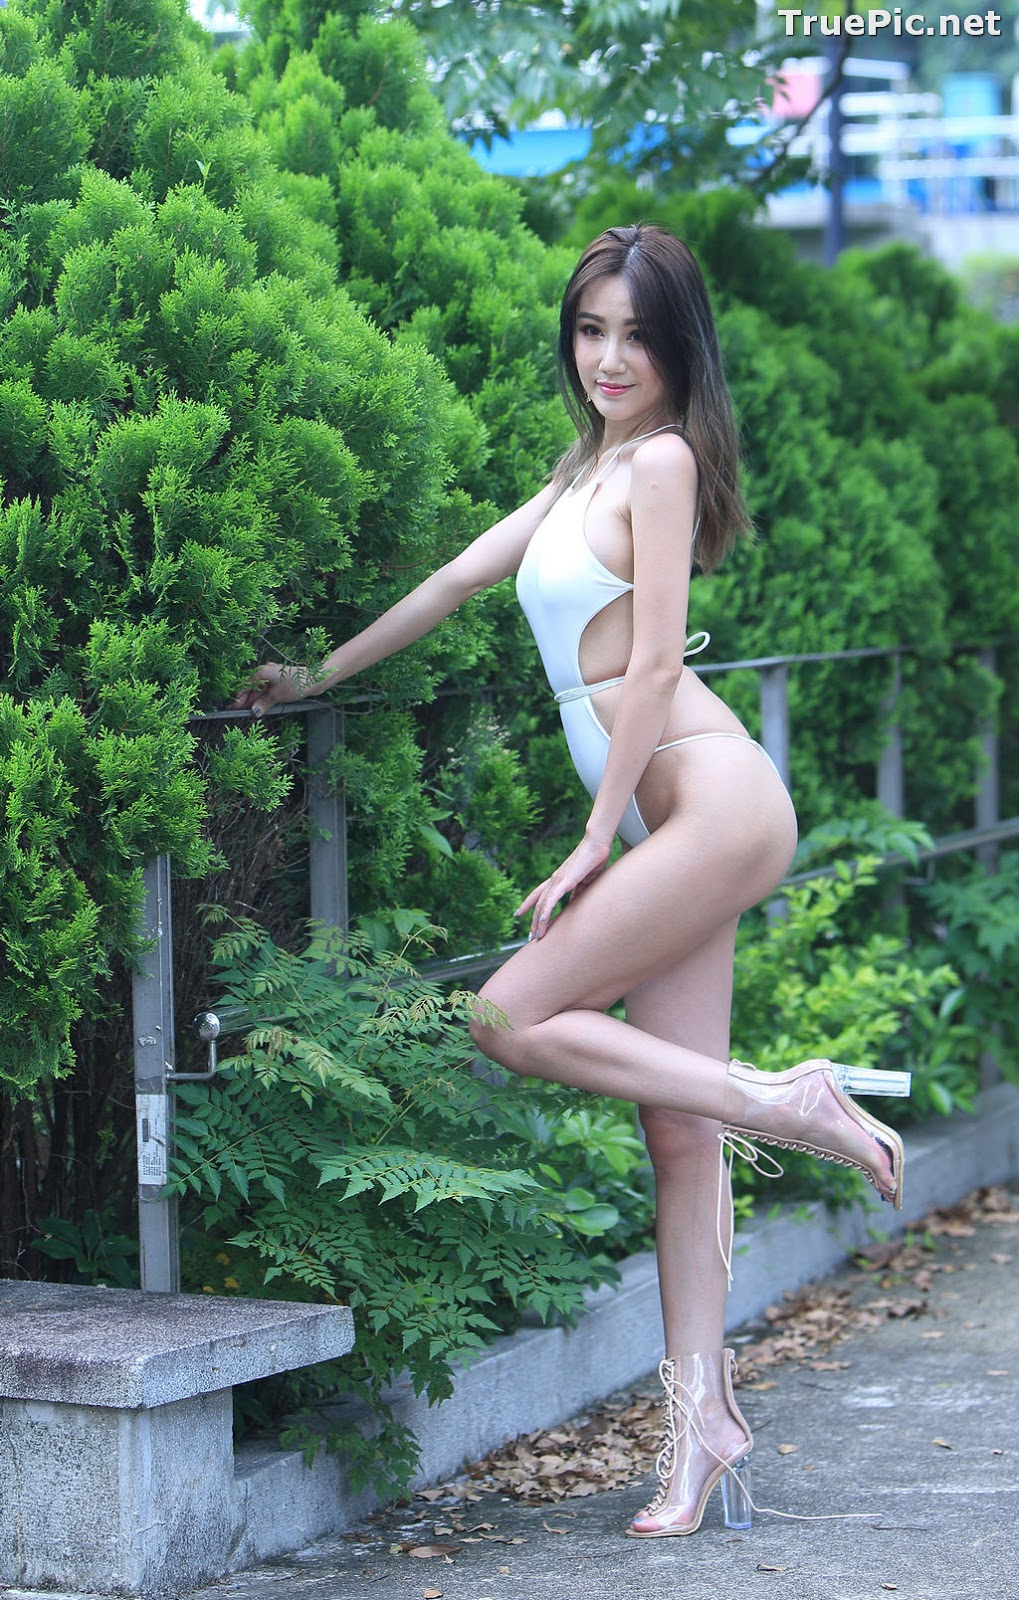 Image Taiwanese Beautiful Model - Suki - White Sexy Bikini Girl - TruePic.net - Picture-9